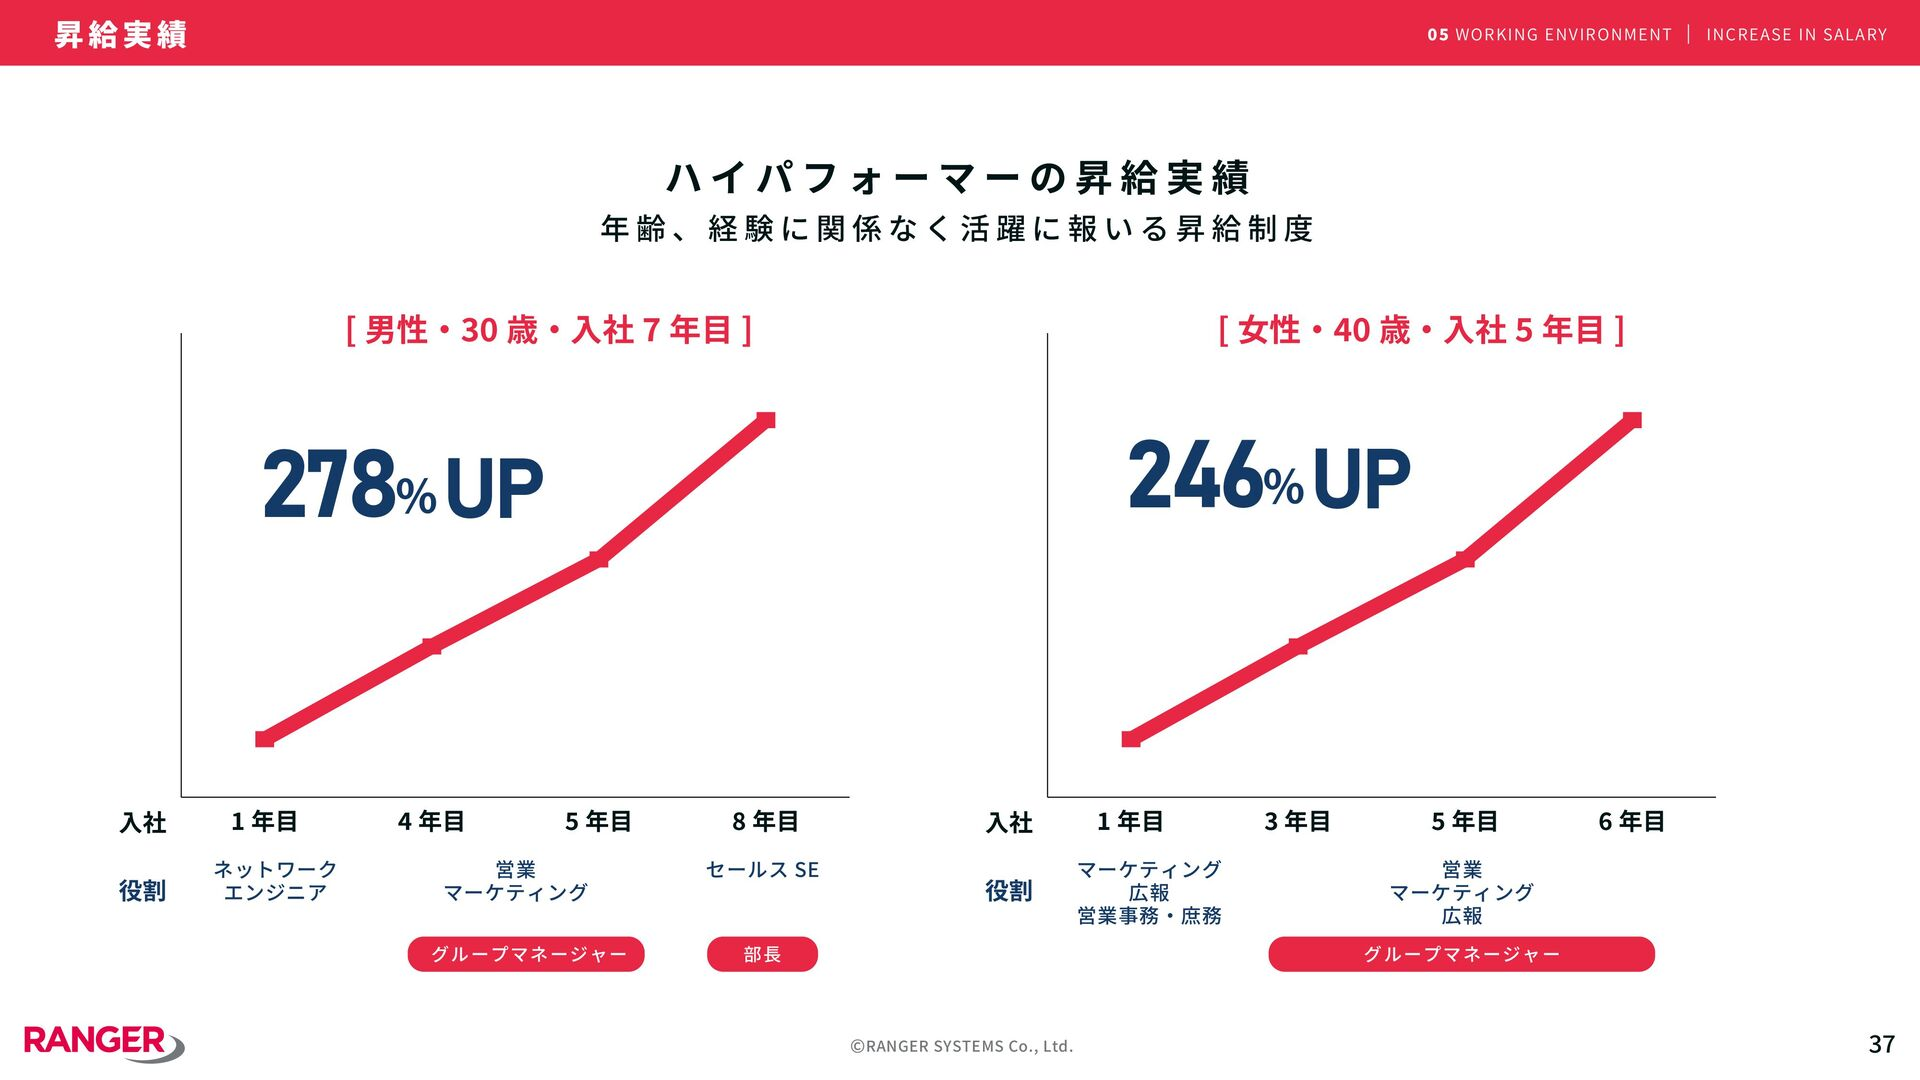 ©RANGER SYSTEMS Co., Ltd. 1 05 働 く 環 境 W O R K ...